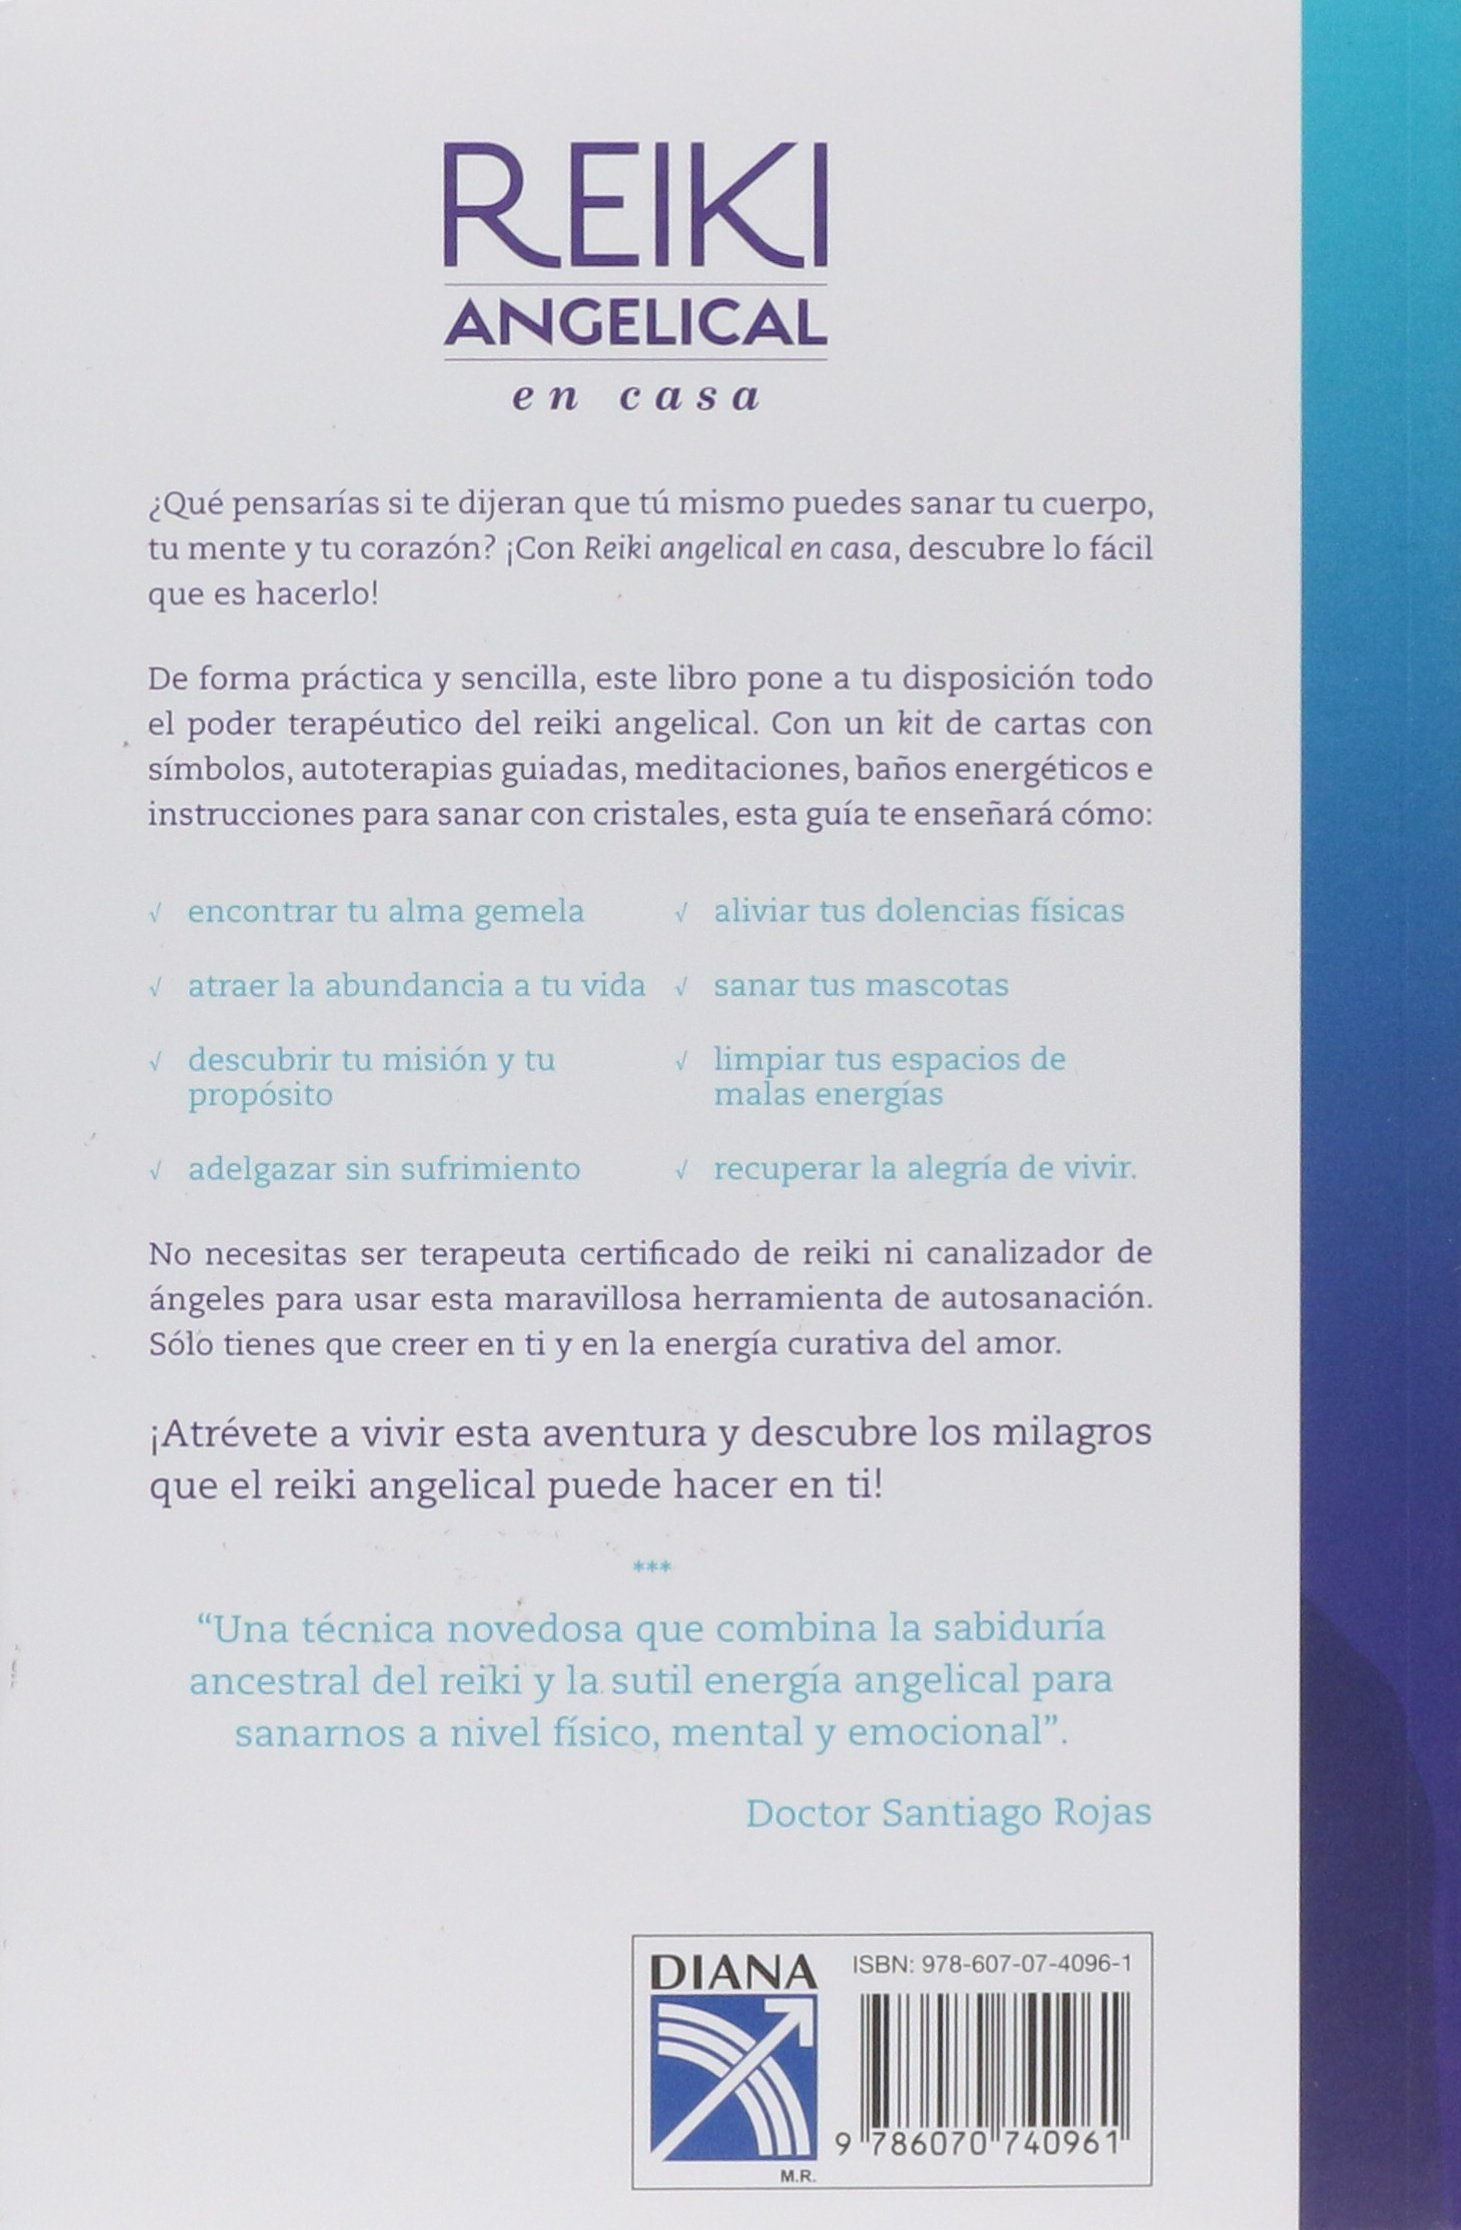 Reiki angelical en casa (Spanish Edition): Salazar ...